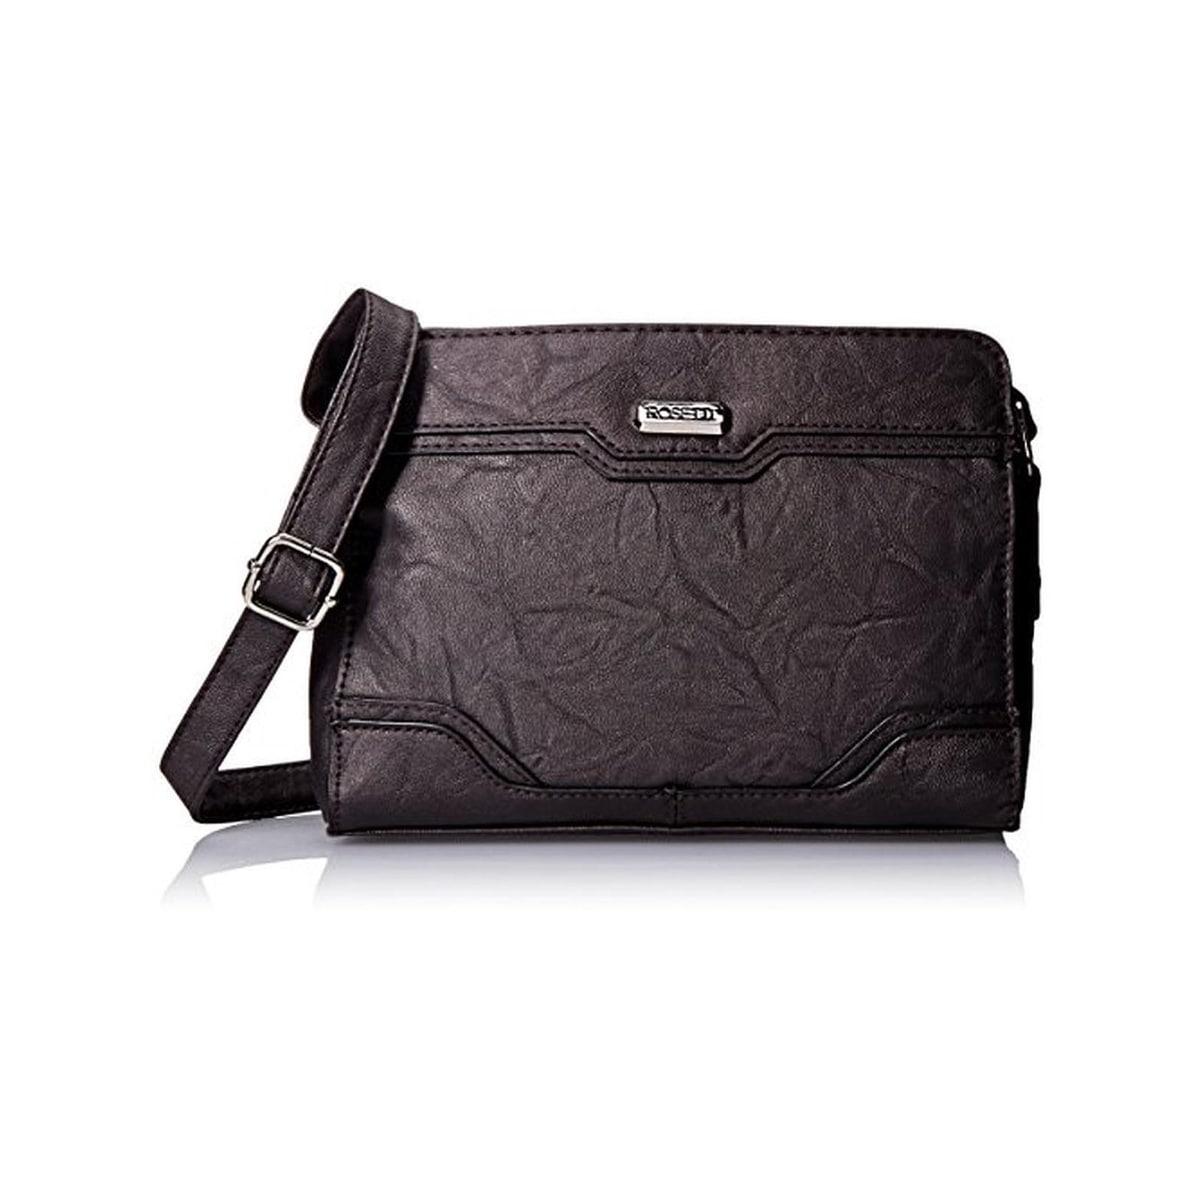 Rosetti Womens Hilary Crossbody Handbag Faux Leather Textured - MEDIUM - Thumbnail 0